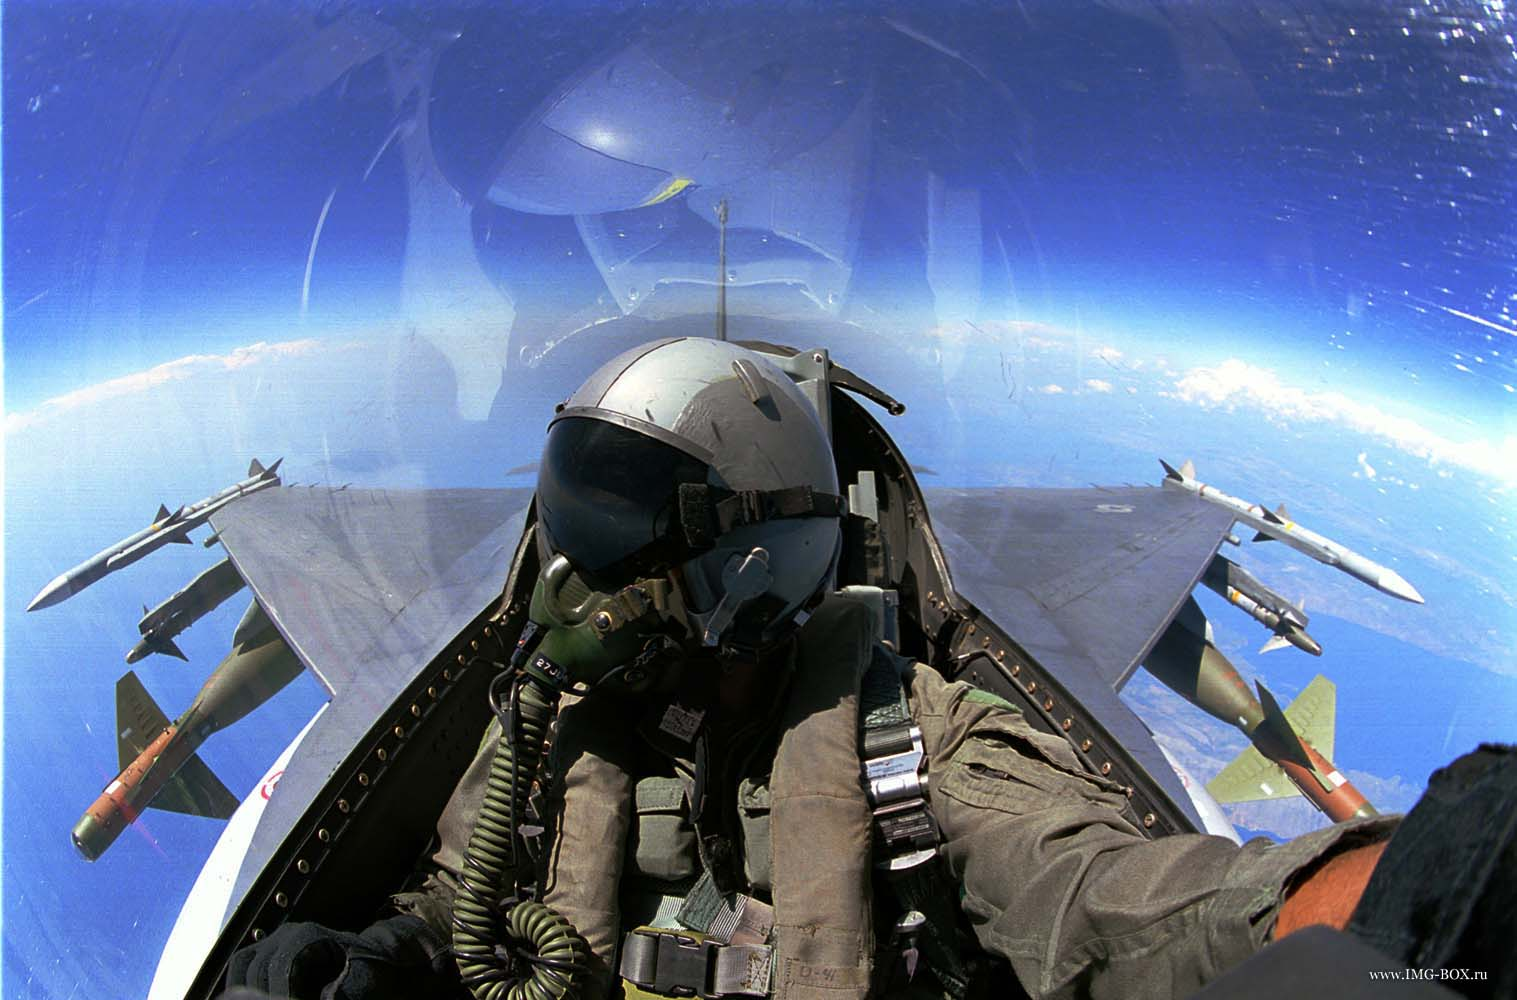 Pilots Wallpapers